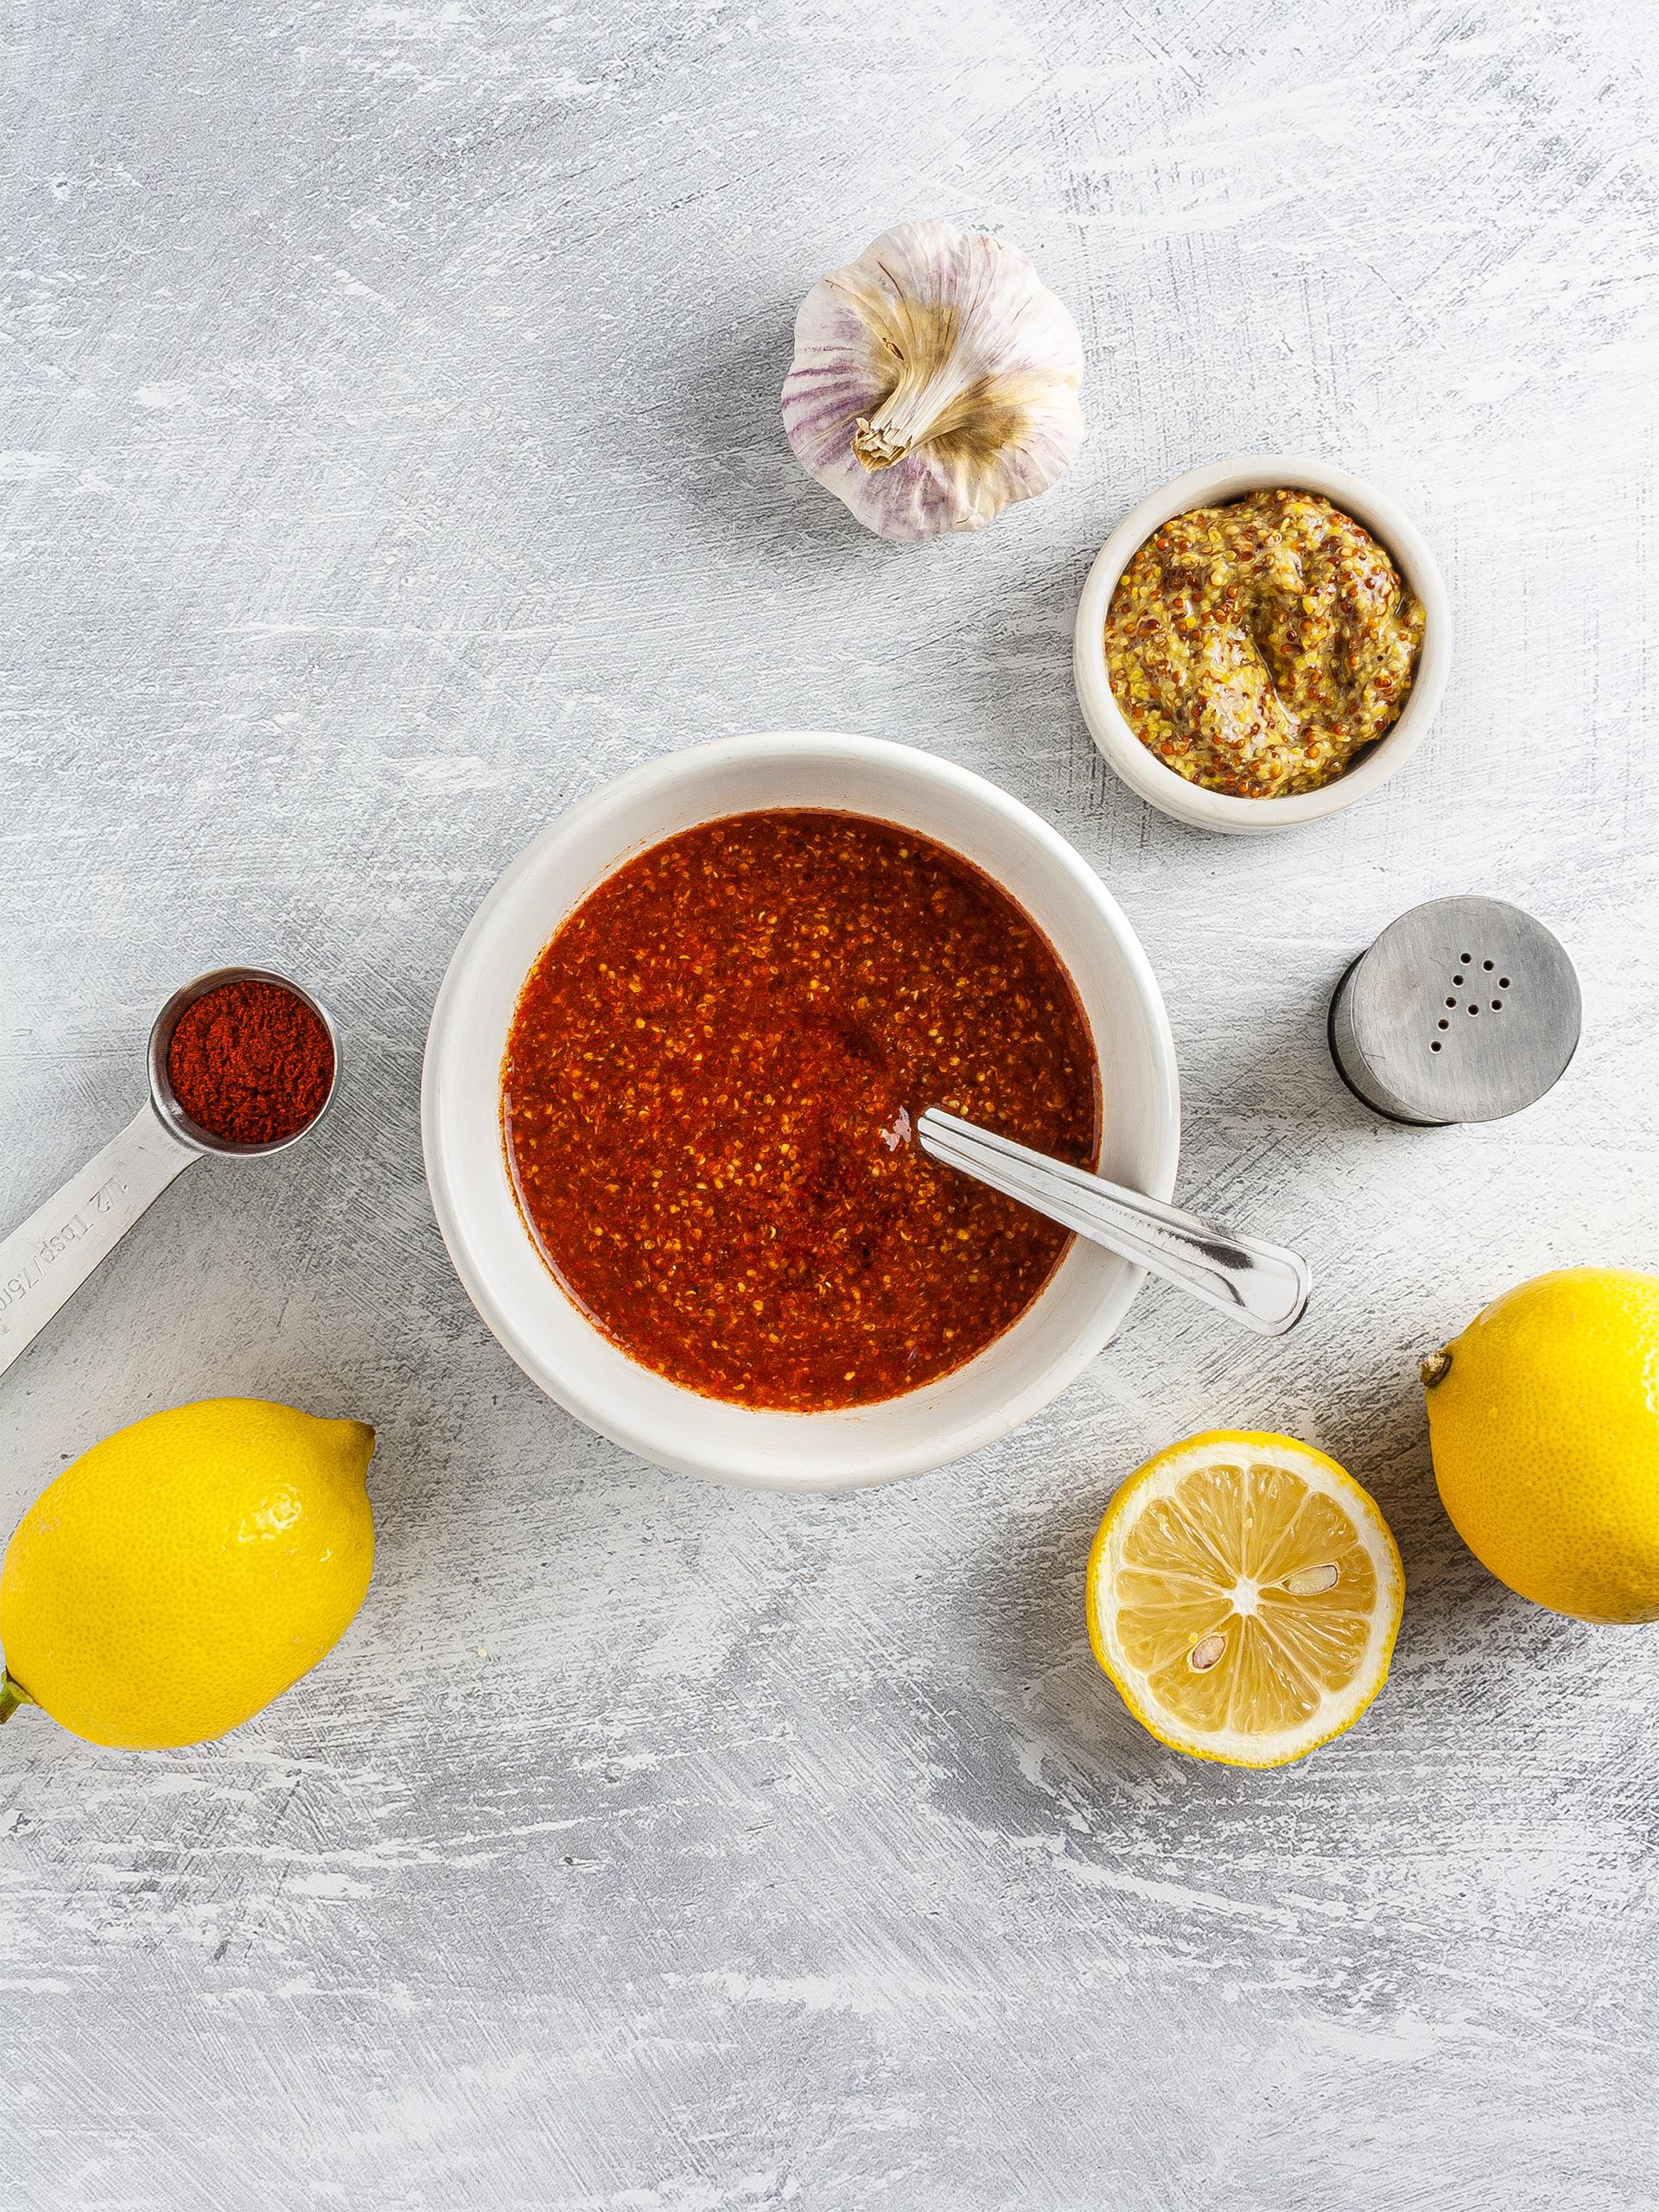 Honey, mustard, and paprika glaze mixture